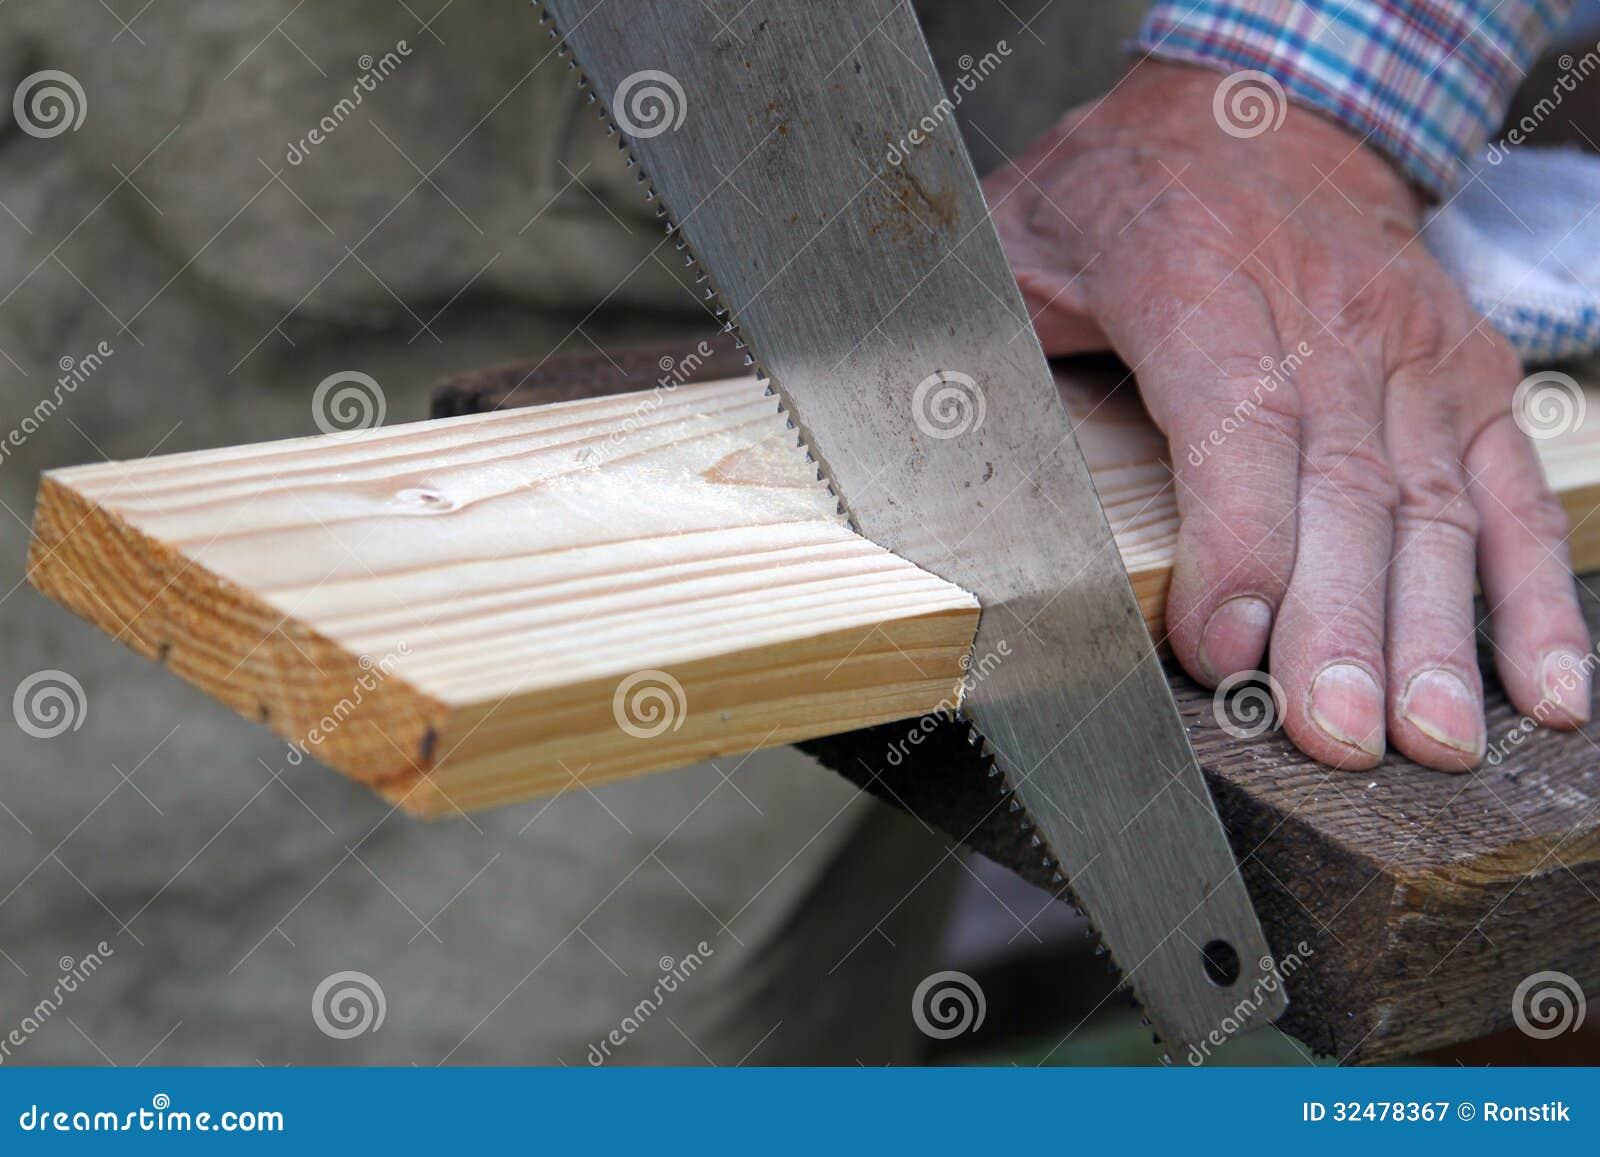 wood cutting hand saws